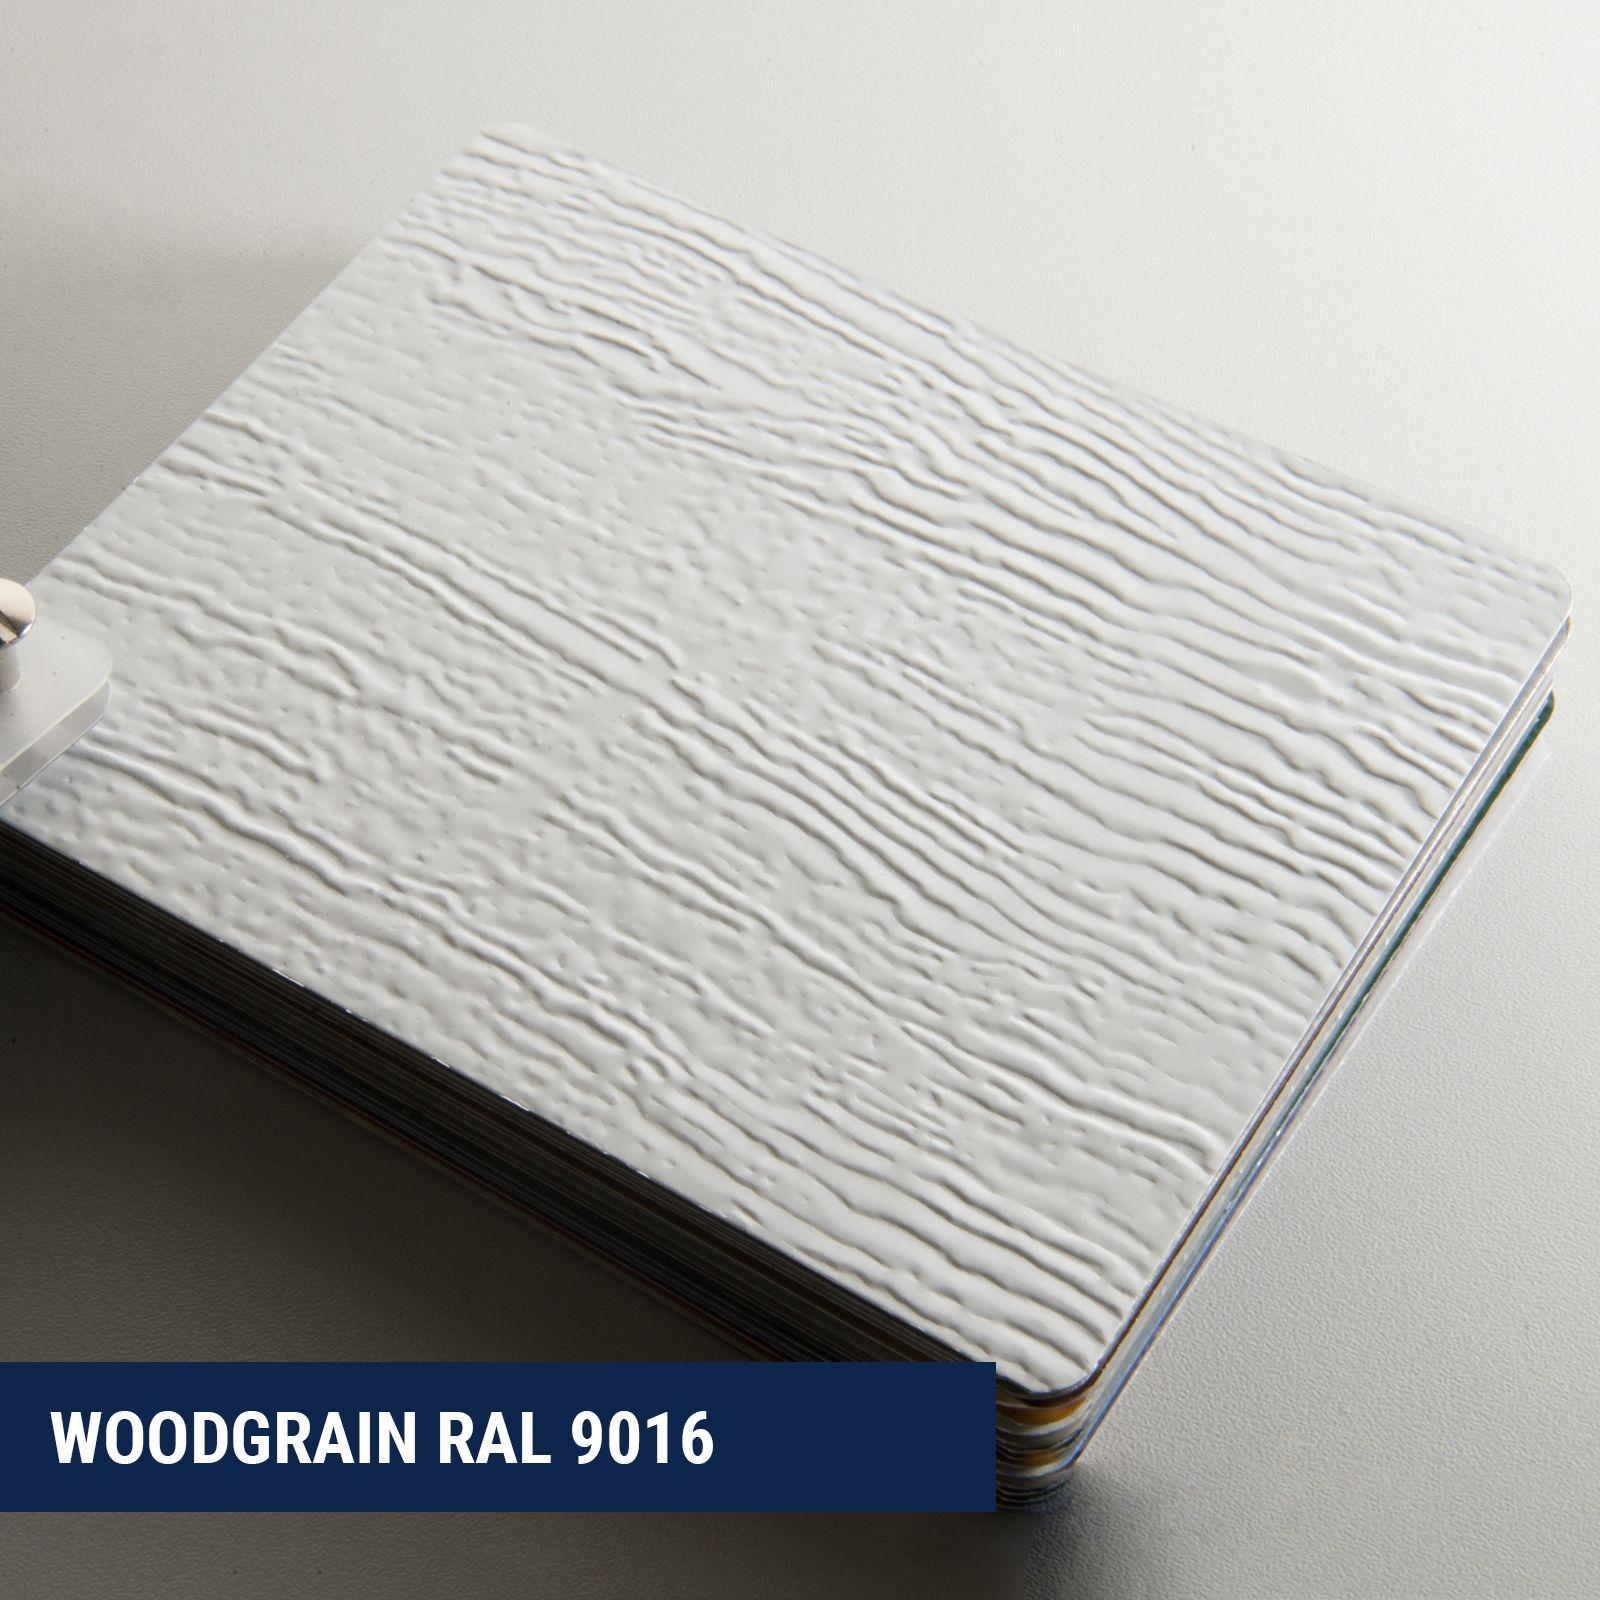 h rmann garagentor sektionaltor renomatic light m sicke woodgrain epu40 doppelw ebay. Black Bedroom Furniture Sets. Home Design Ideas